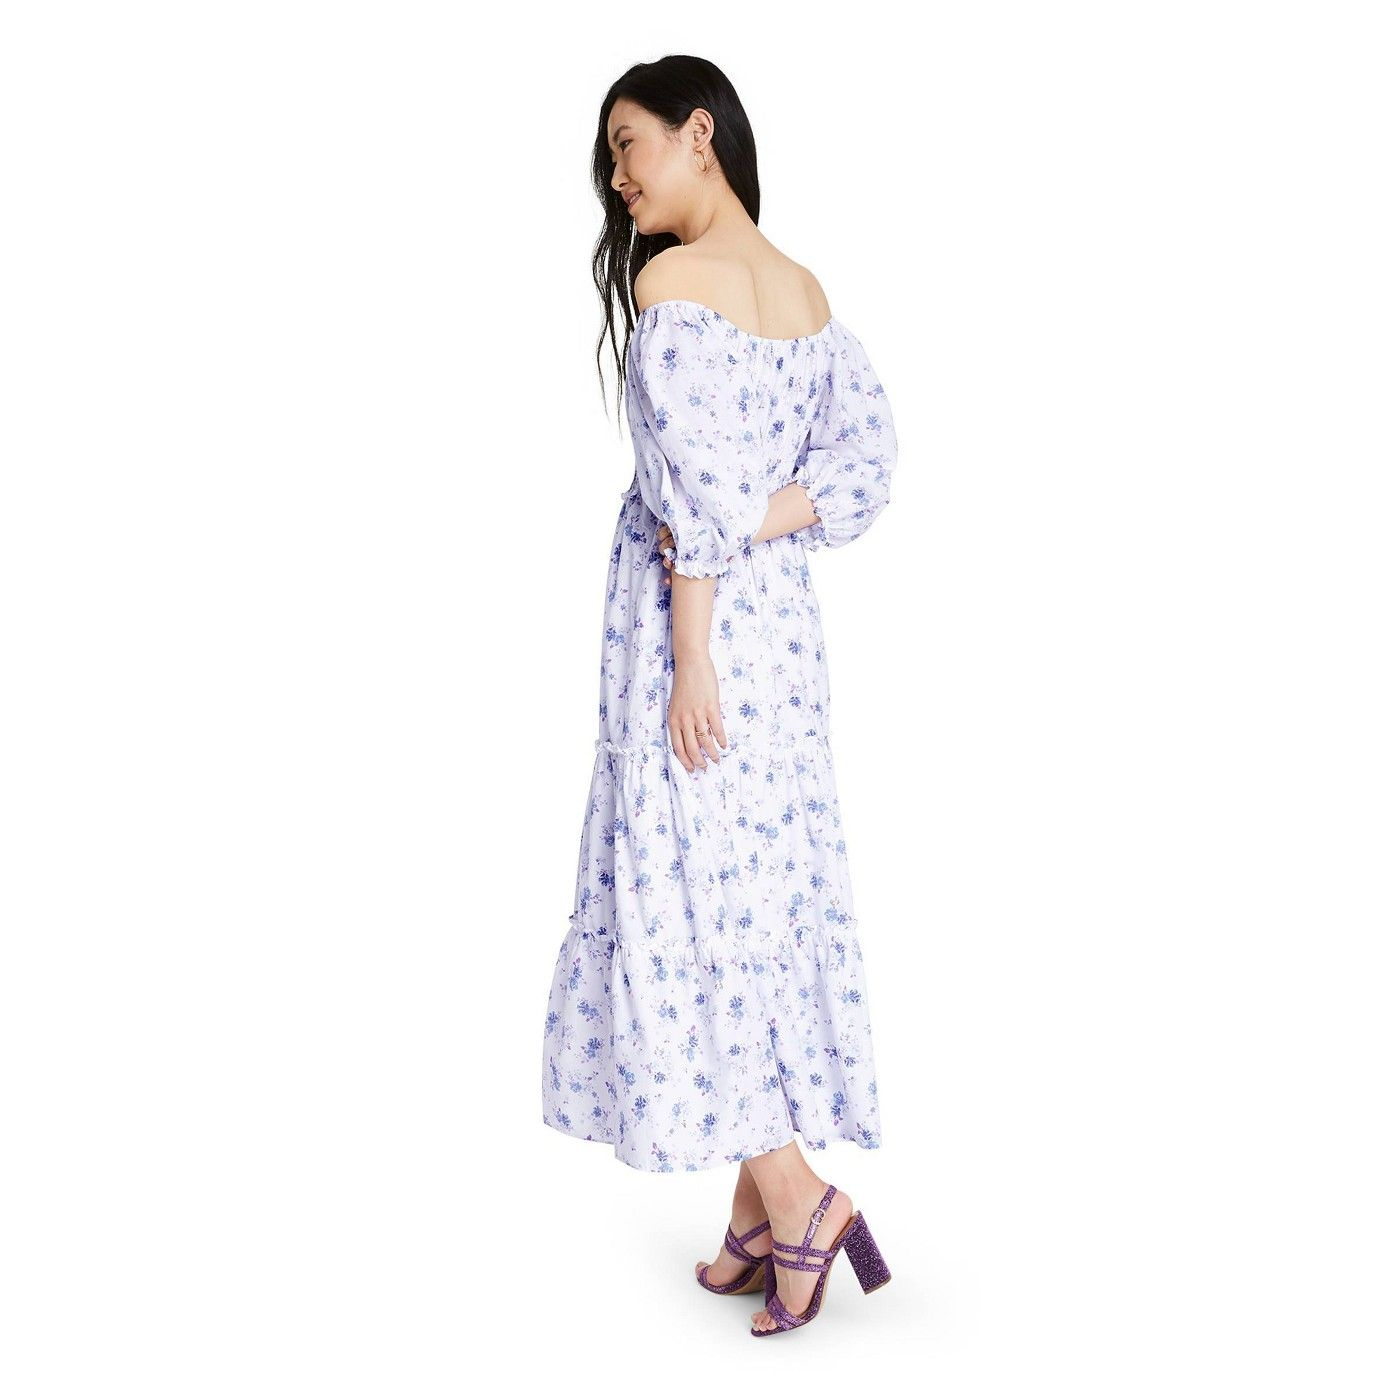 Women S Gemma Puff Sleeve Dress Loveshackfancy For Target Regular Plus White Blue Spon Puffed Sleeves Dress Maxi Dress With Sleeves Dresses With Sleeves [ 1400 x 1400 Pixel ]